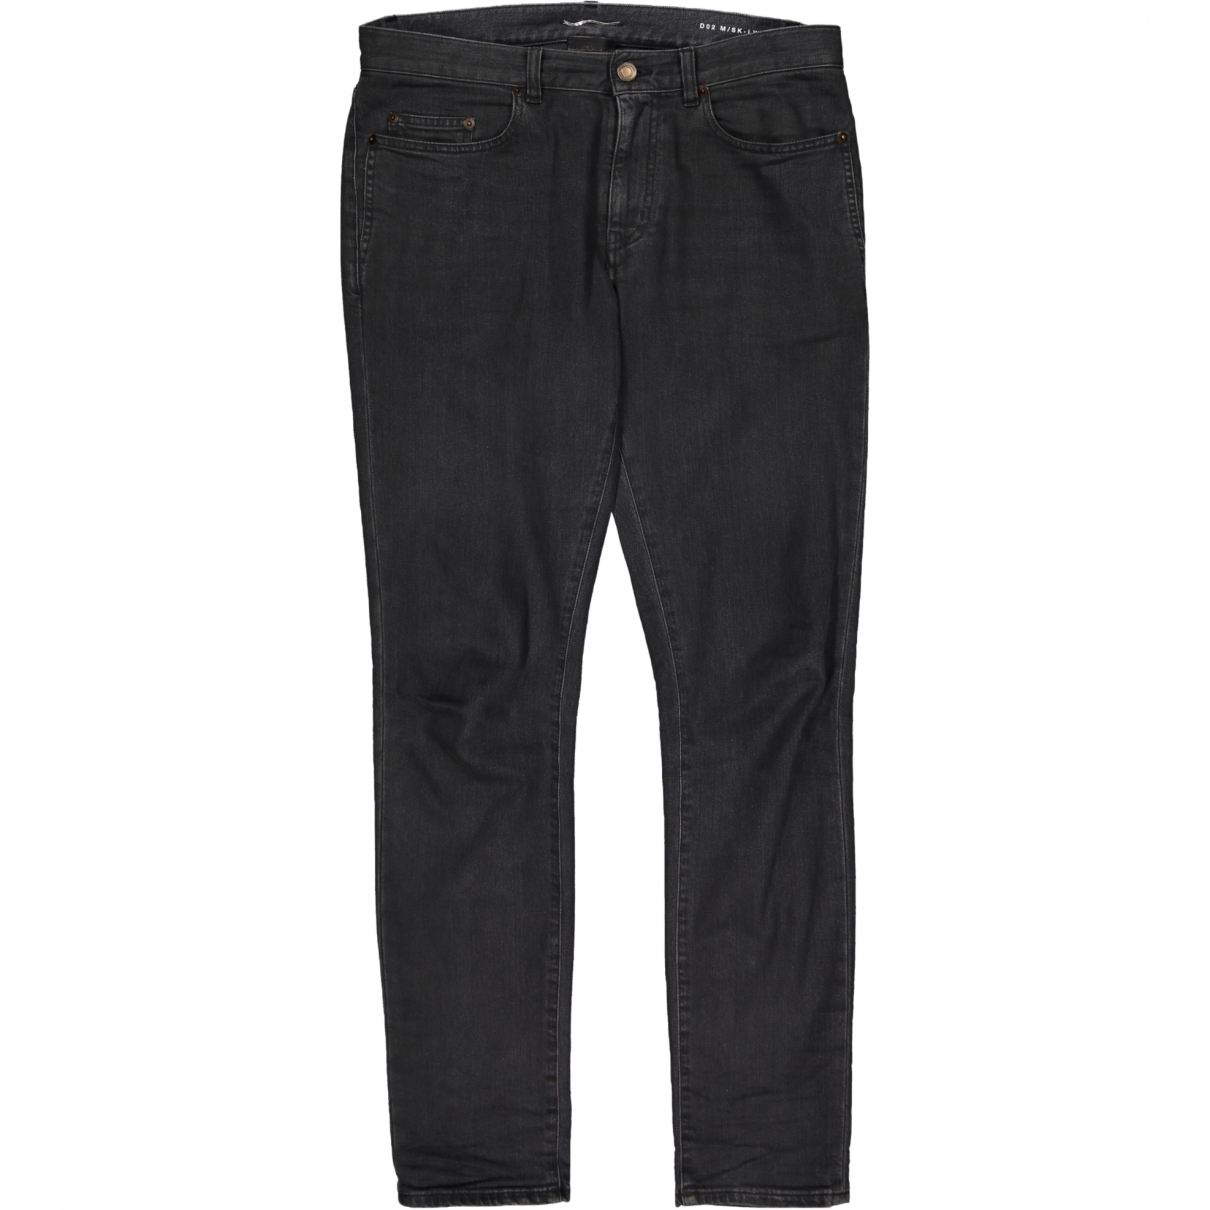 Saint Laurent \N Grey Cotton - elasthane Jeans for Men 31 US